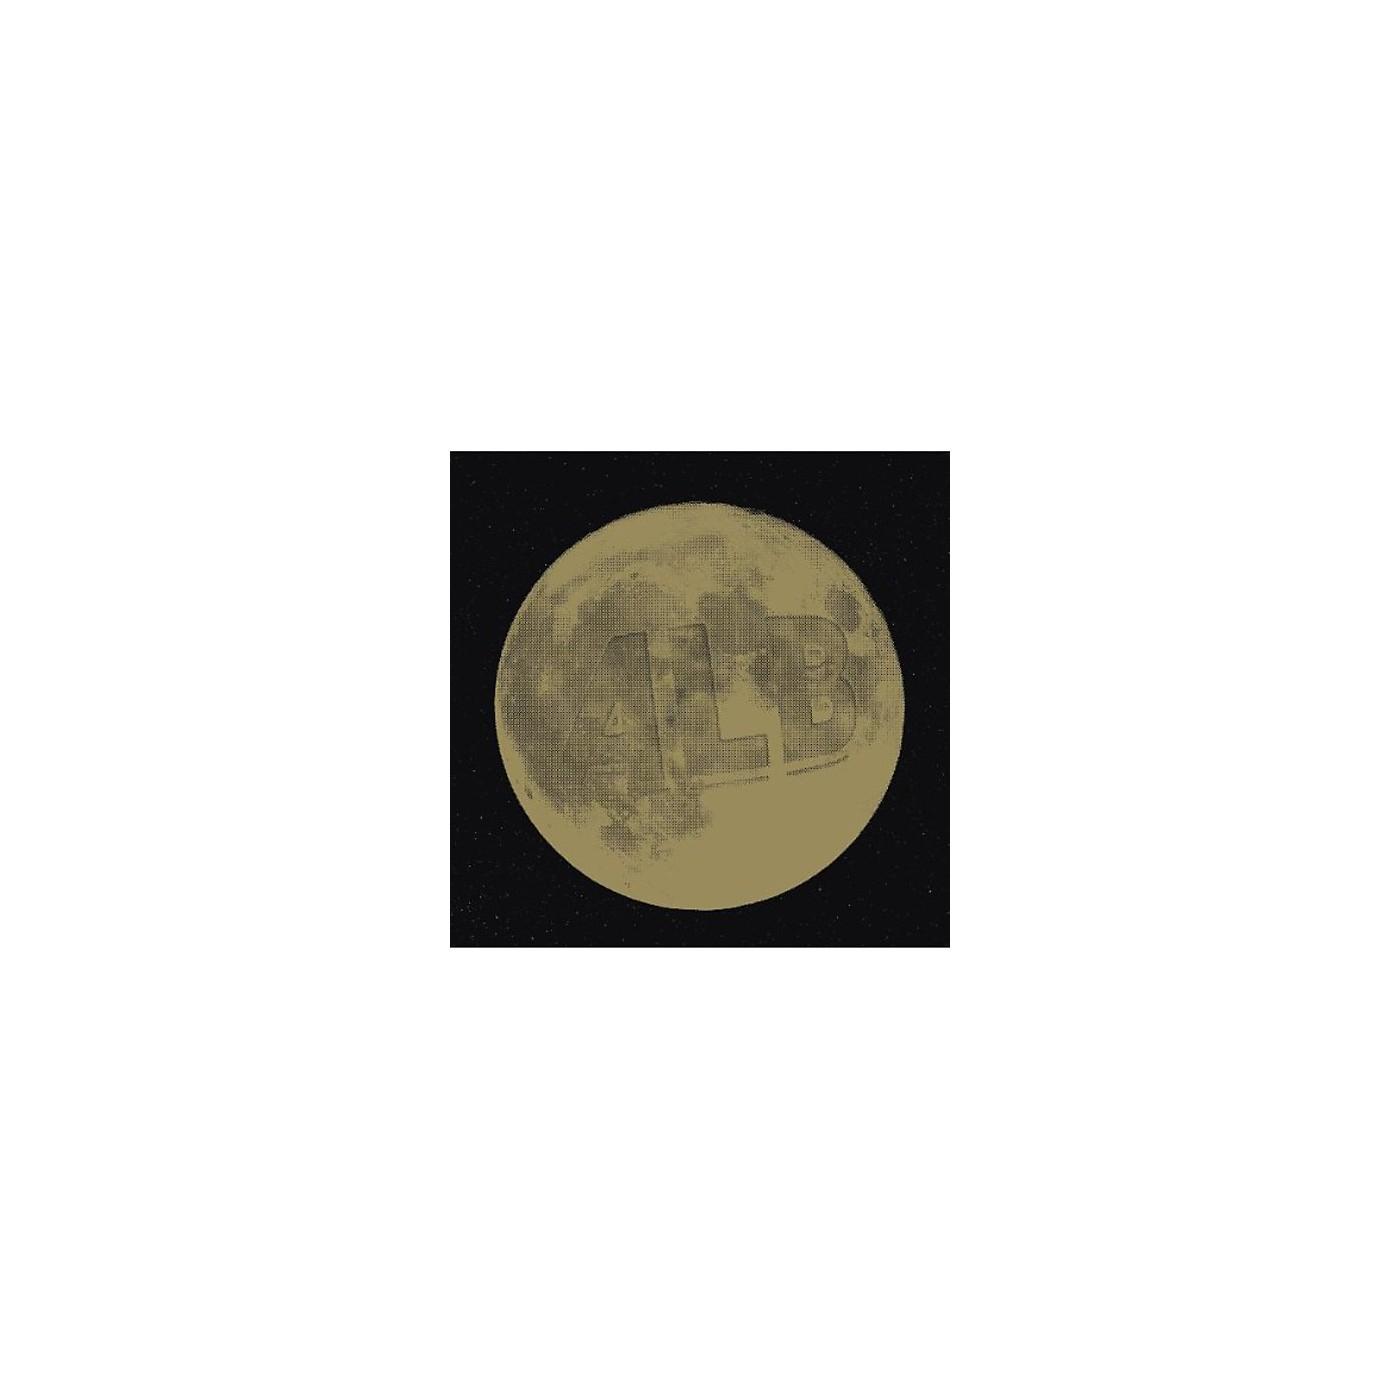 Alliance Alb - Whispers Under the Moonlight/Golden CH thumbnail